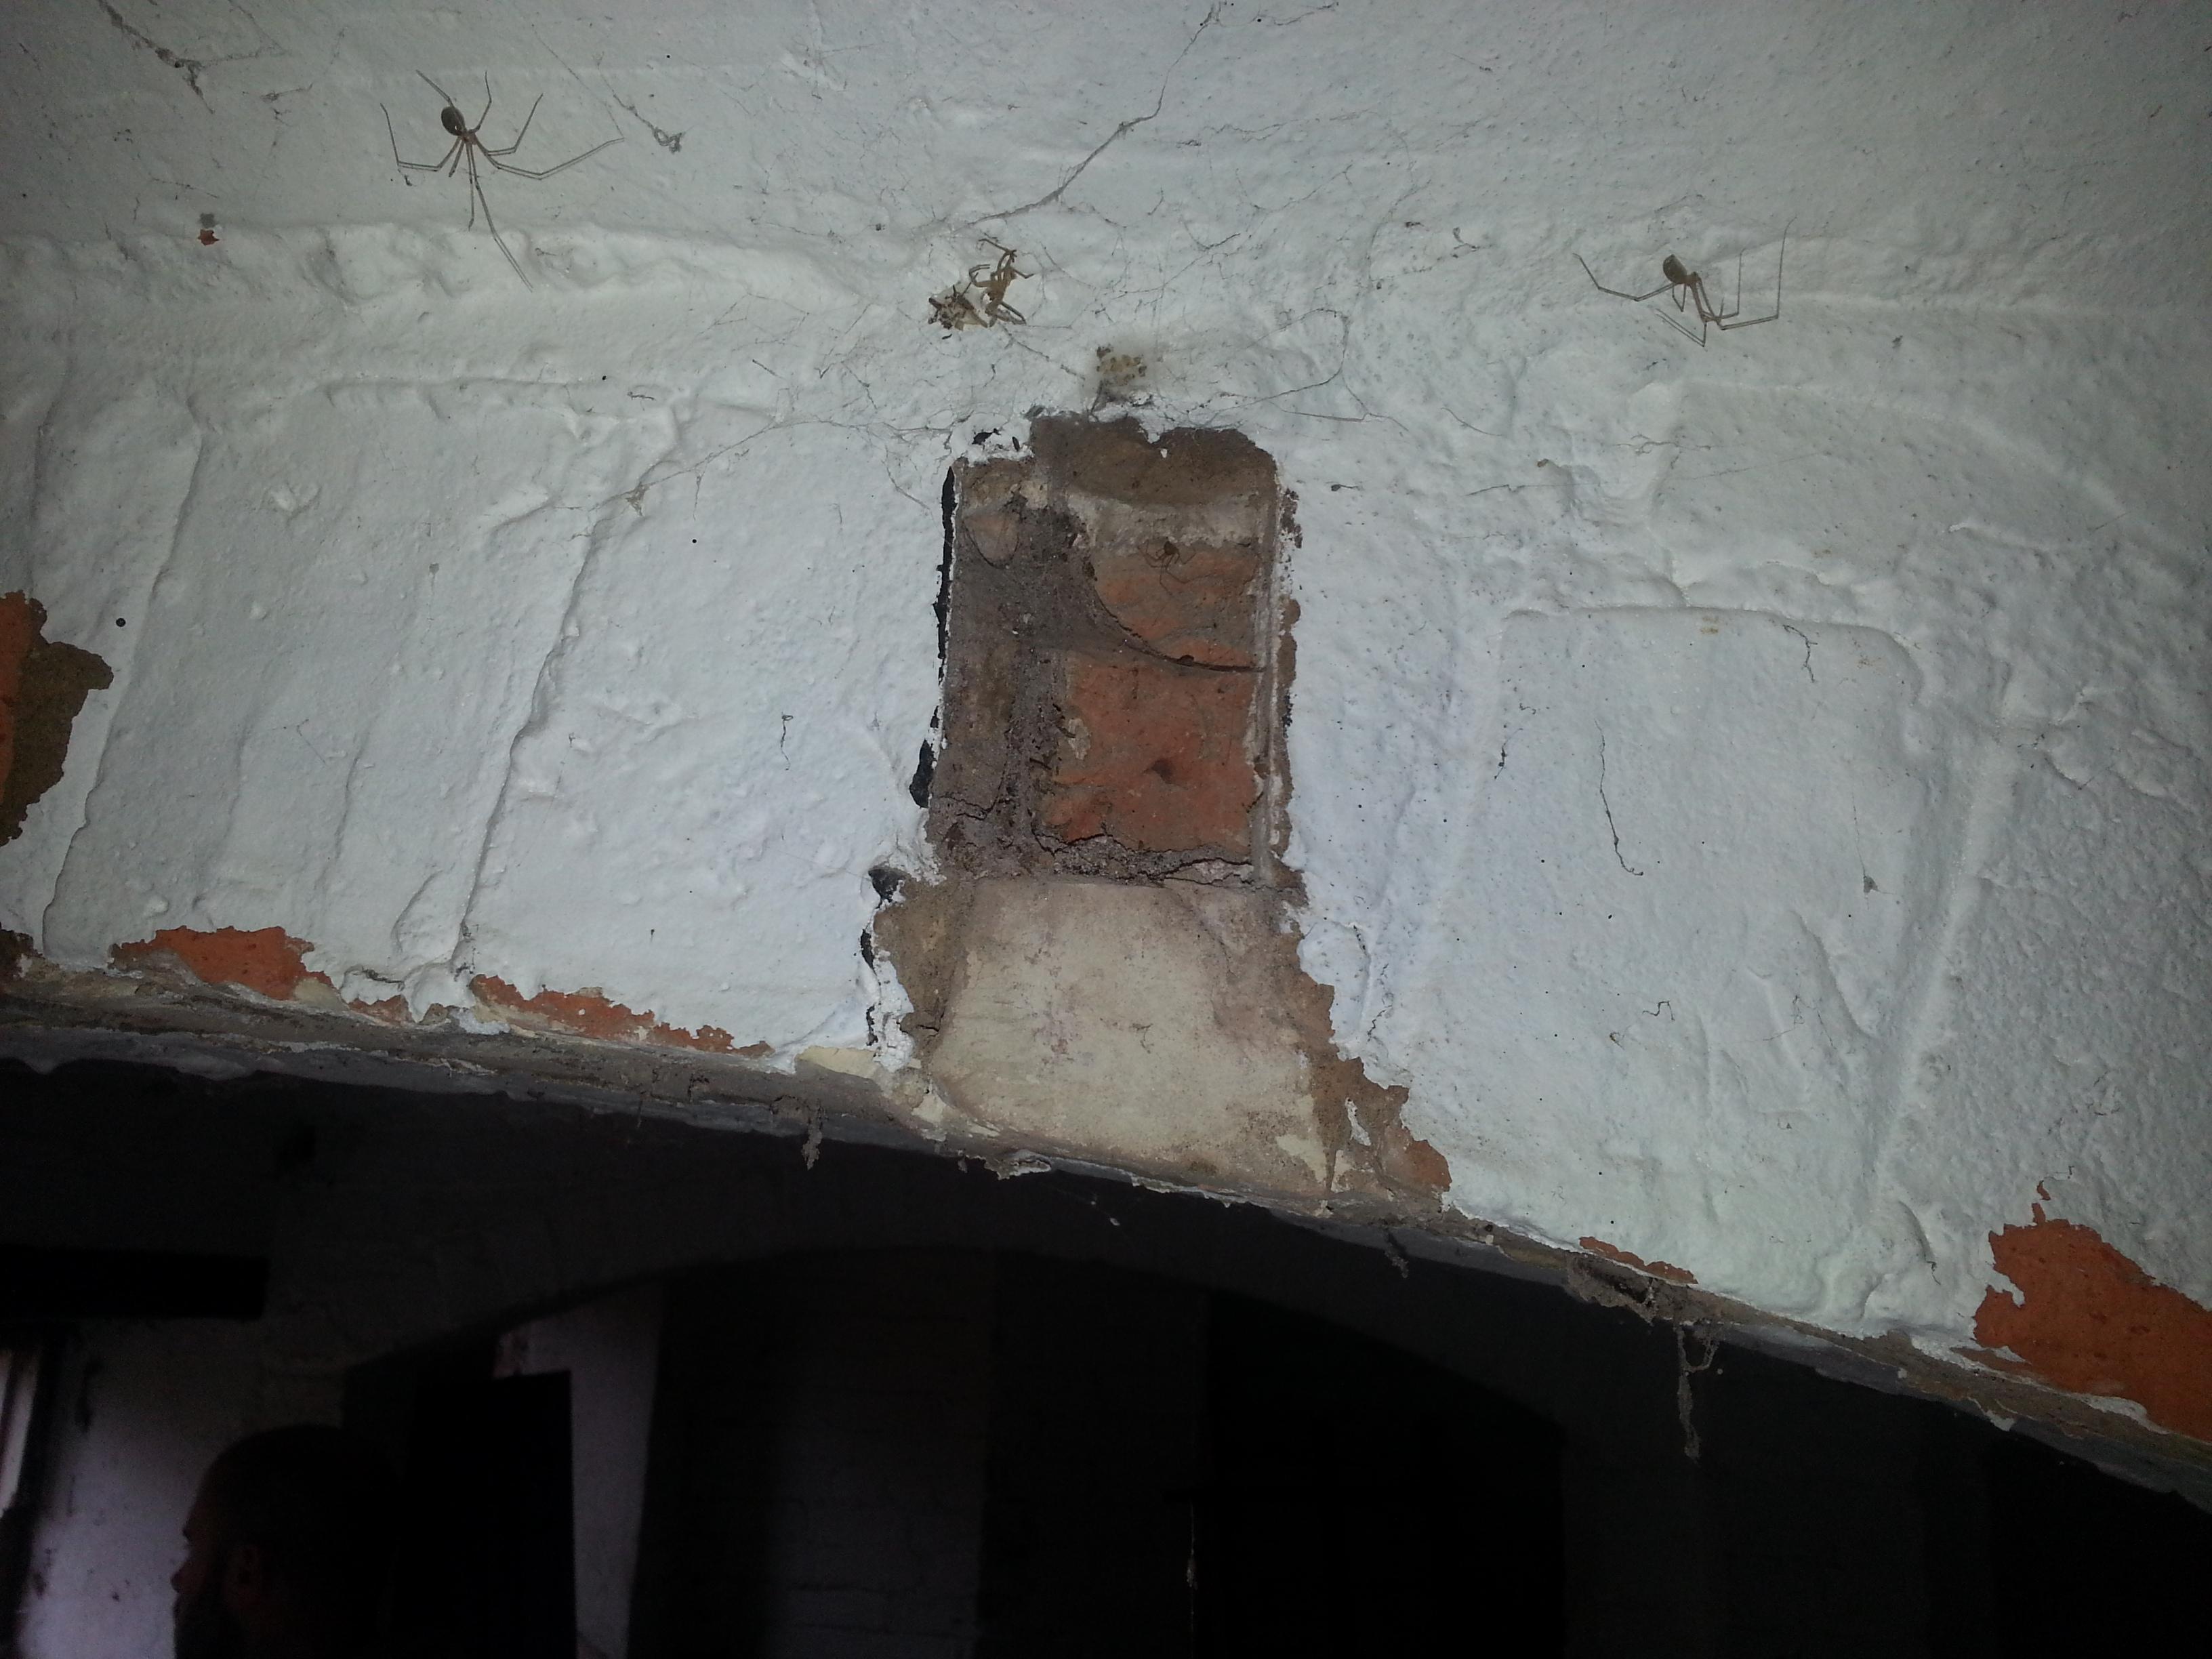 Ceiling arch repairs